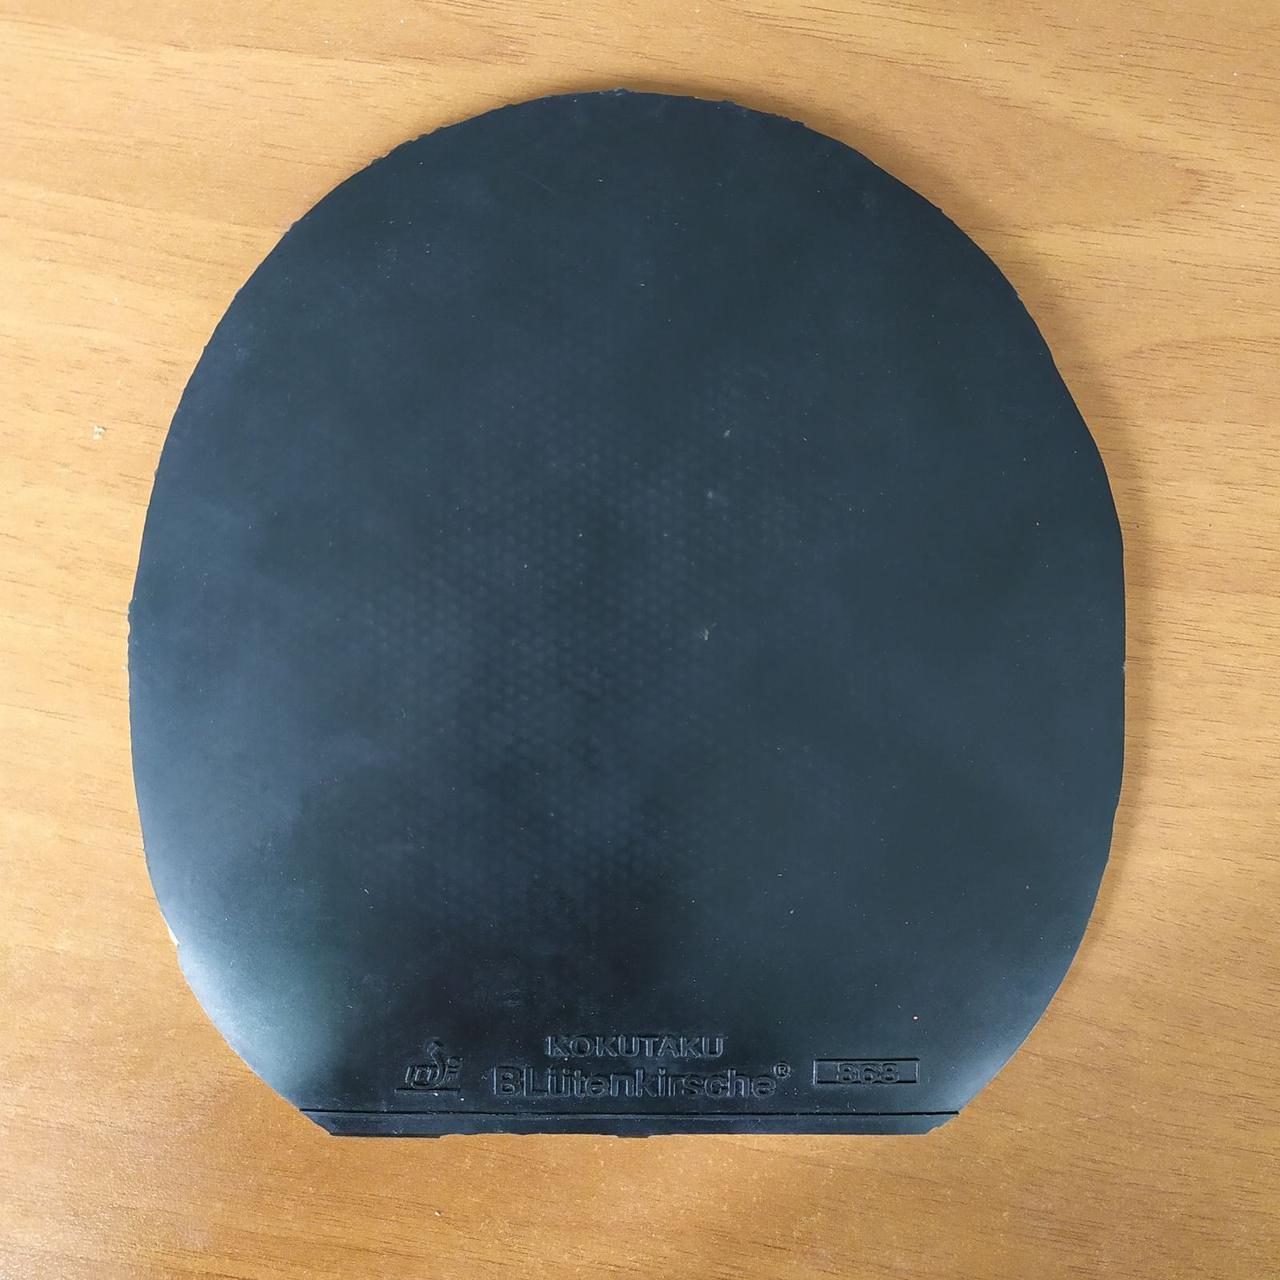 Накладка Kokutaku Blutenkirshce 868 Б/У